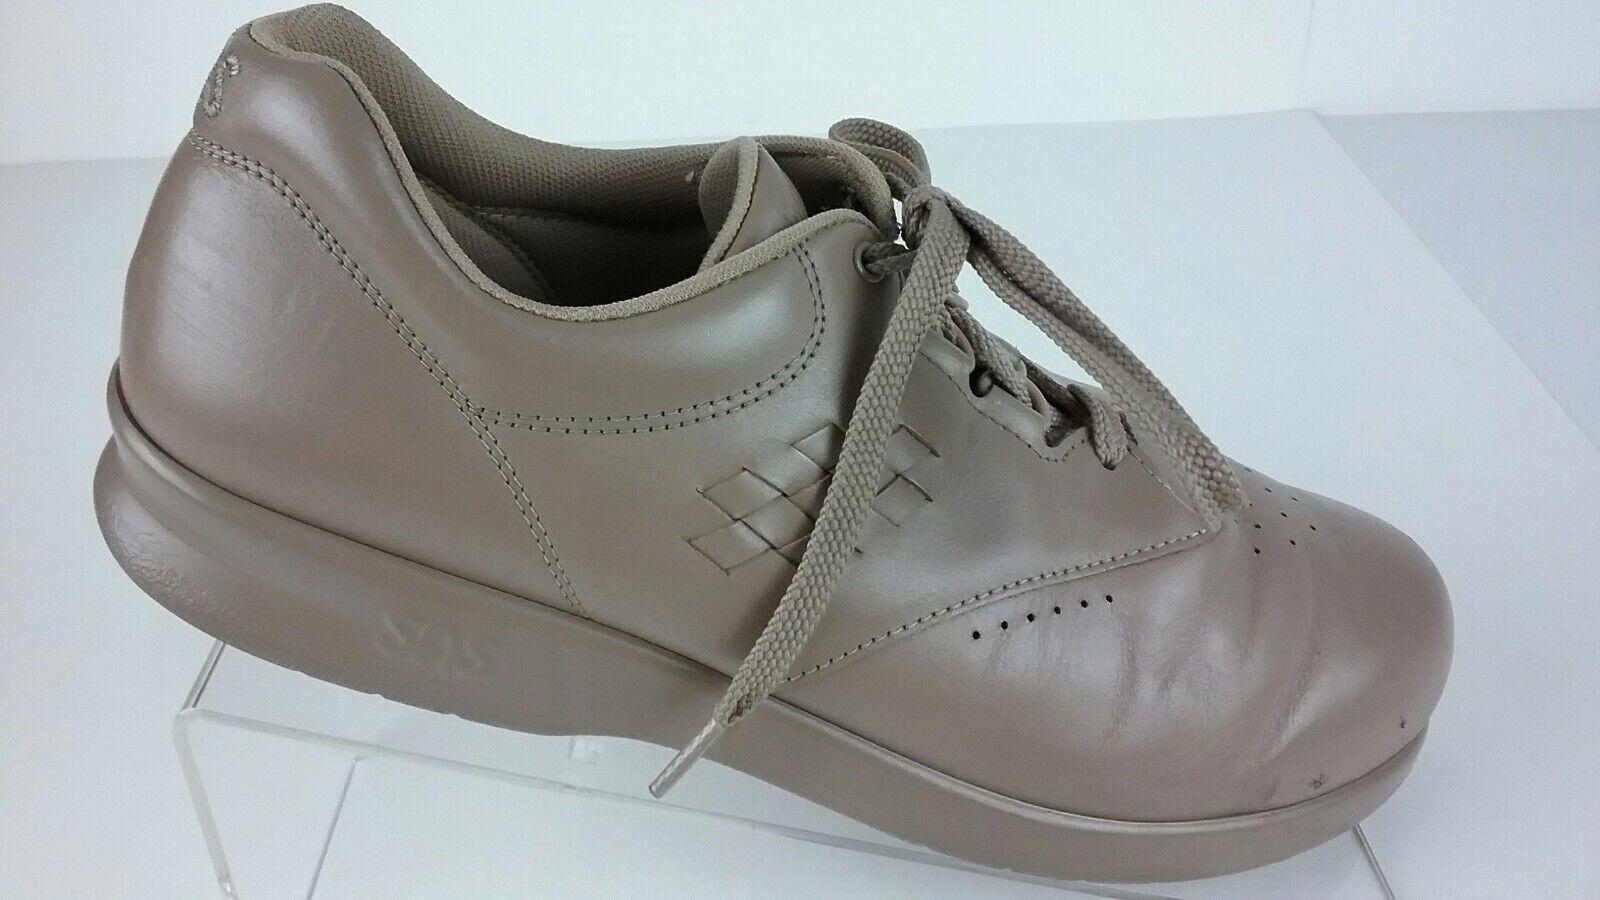 SAS Free Time Tripad Comfort Women's 8.5 M Oxford Lace Up shoes R1-S 7